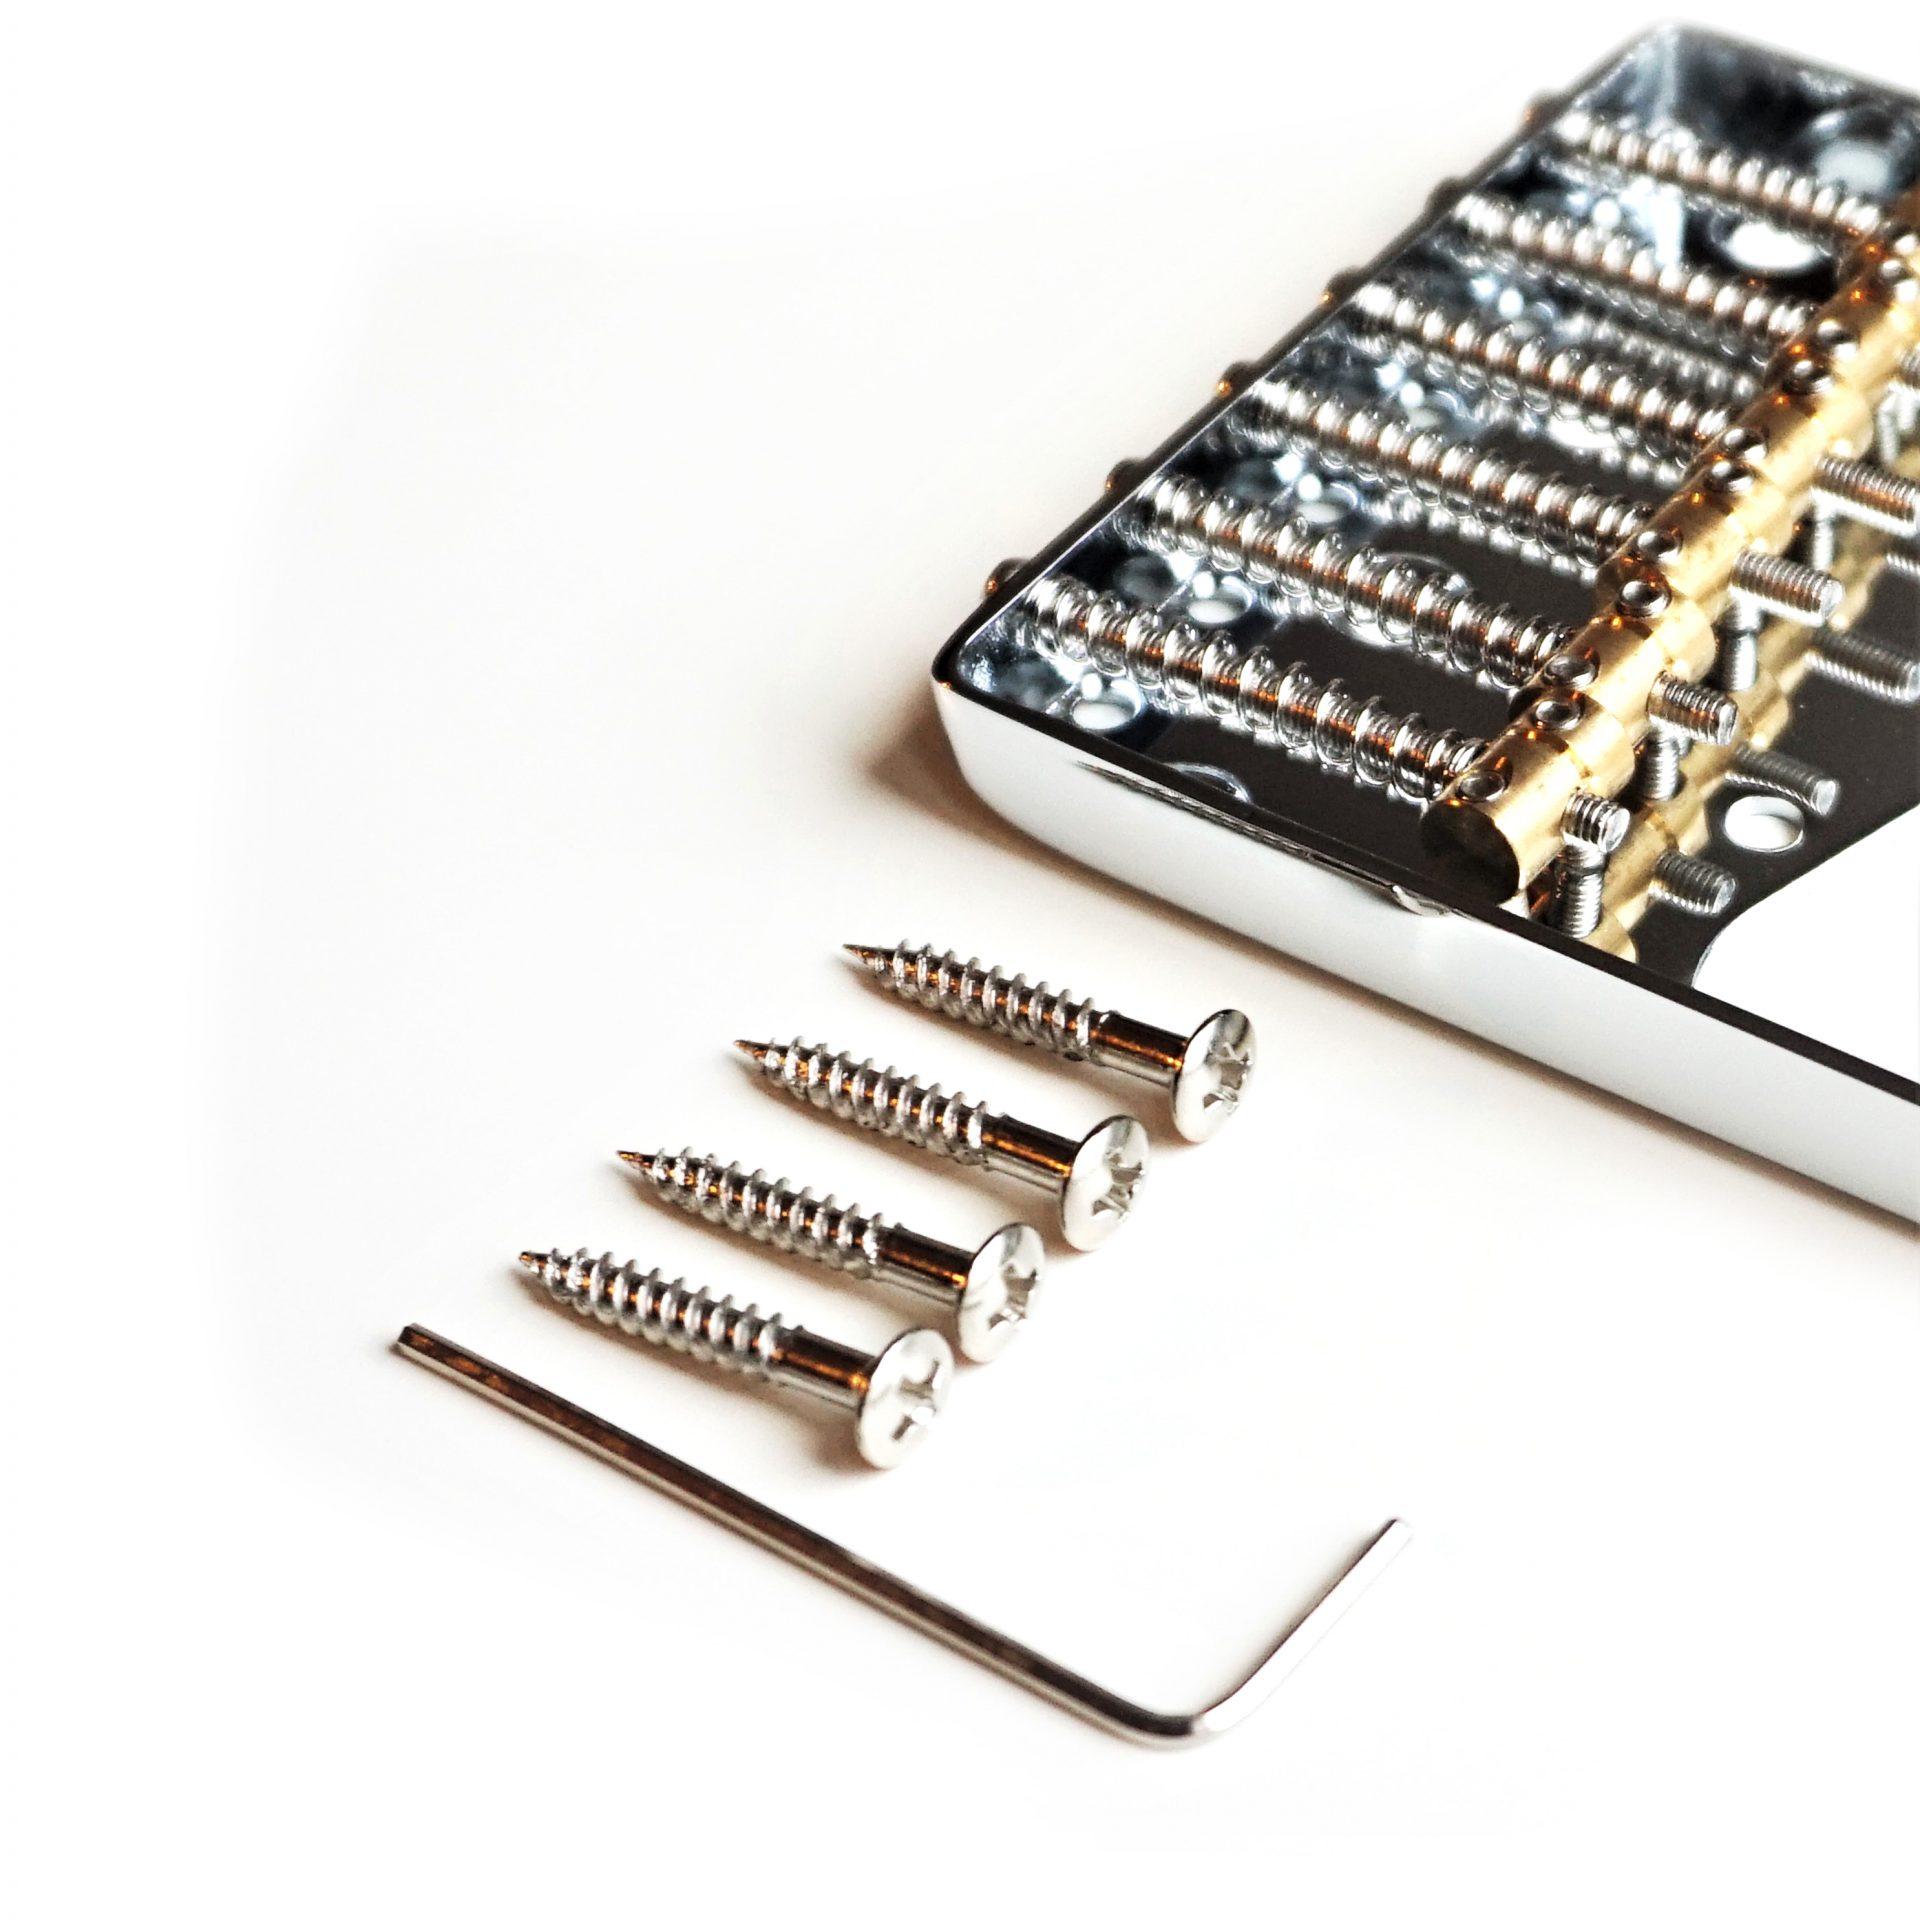 telecaster ashtray bridge with 6 individual brass saddles guitar anatomy. Black Bedroom Furniture Sets. Home Design Ideas